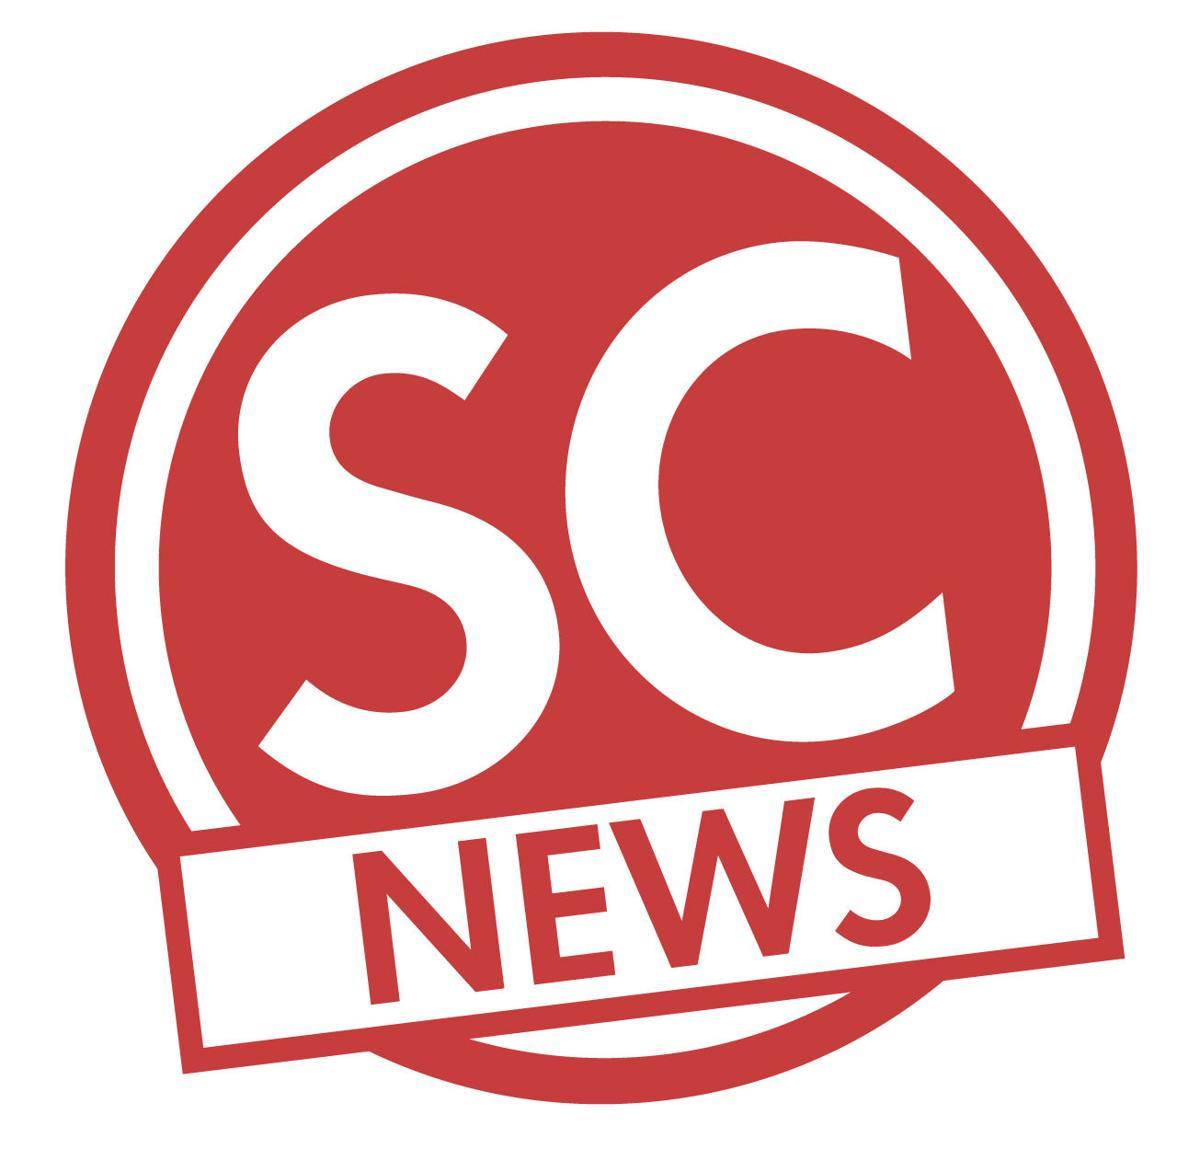 SC News logo